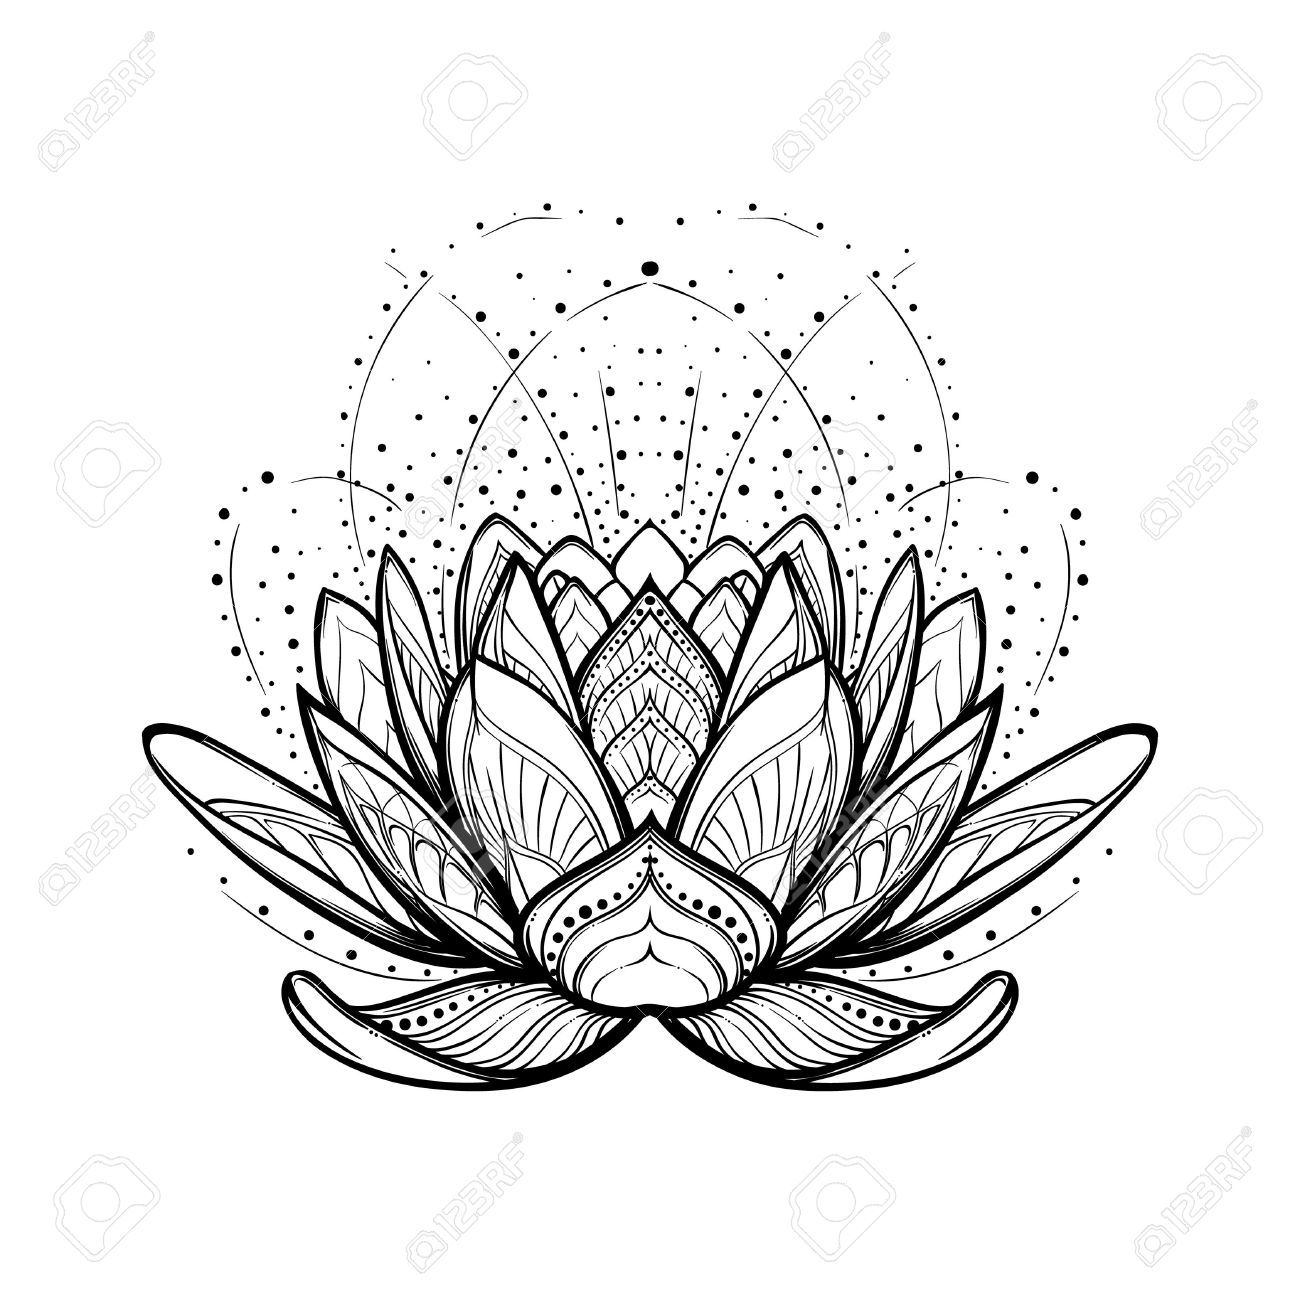 Lotus Flower Intricate Stylized Linear Drawing Isolated On White Lotus Flower Drawing Lotus Flower Tattoo Design Lotus Flower Art